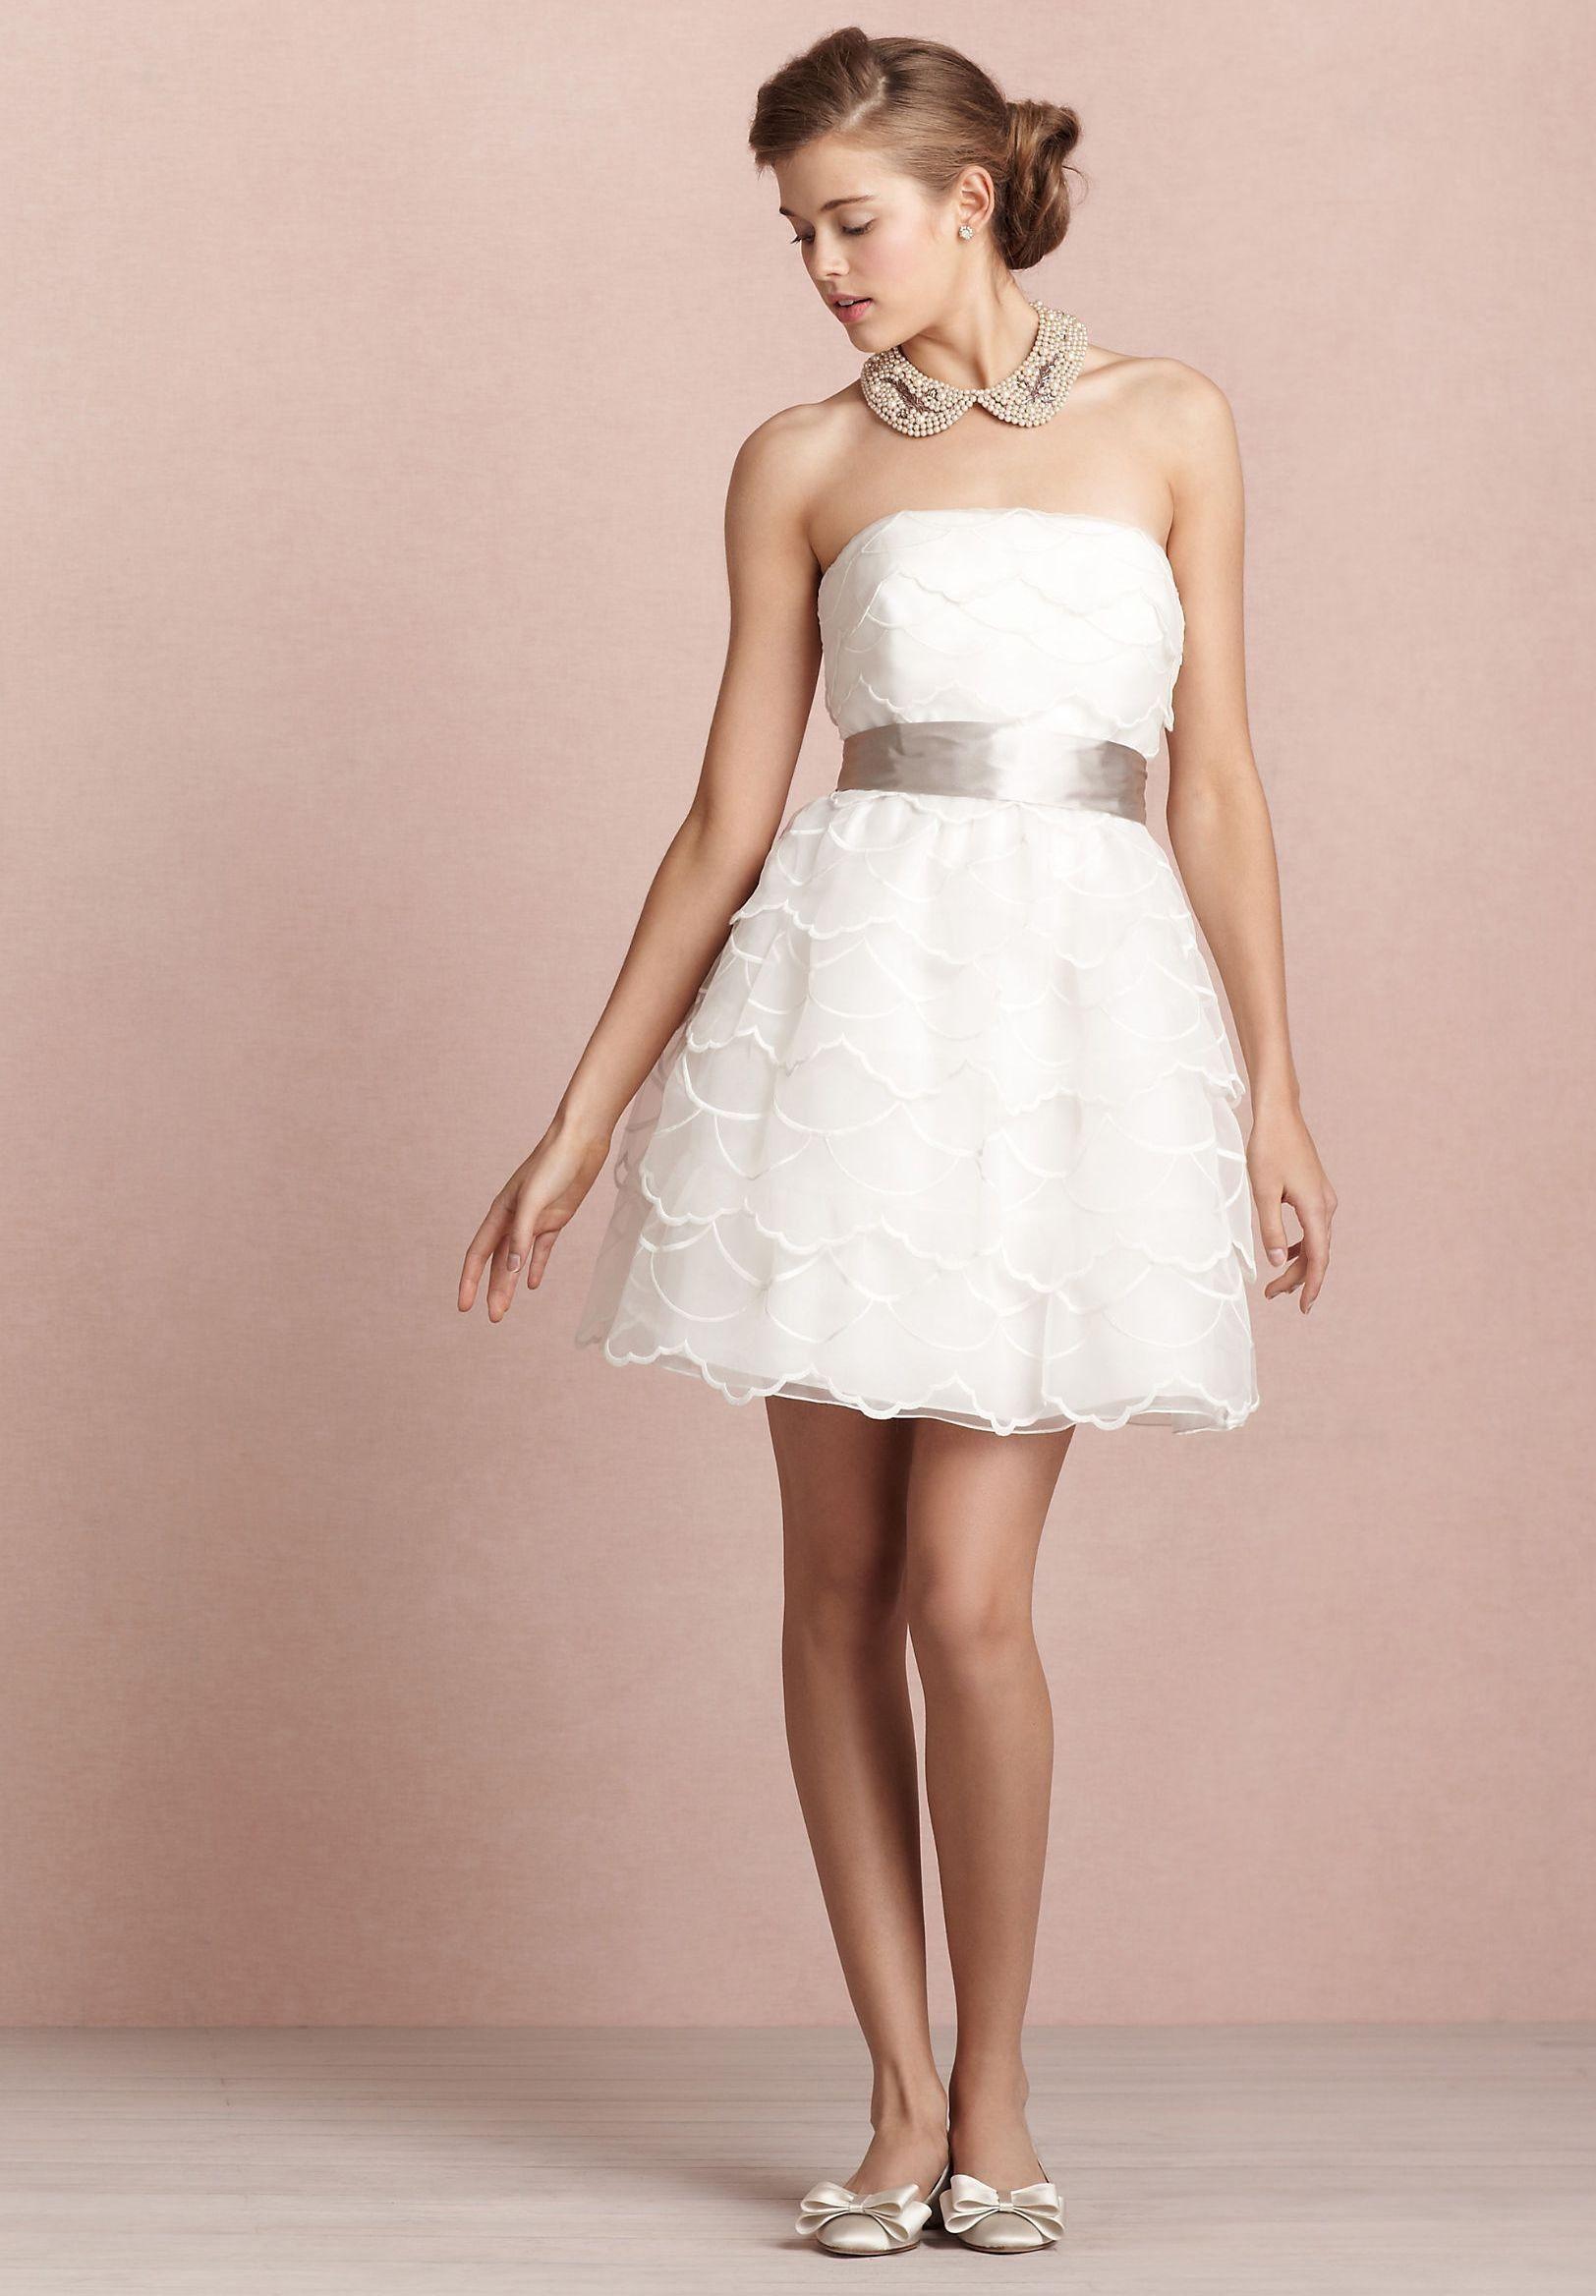 17 Best images about Wedding Reception Dresses on Pinterest  Jim ...